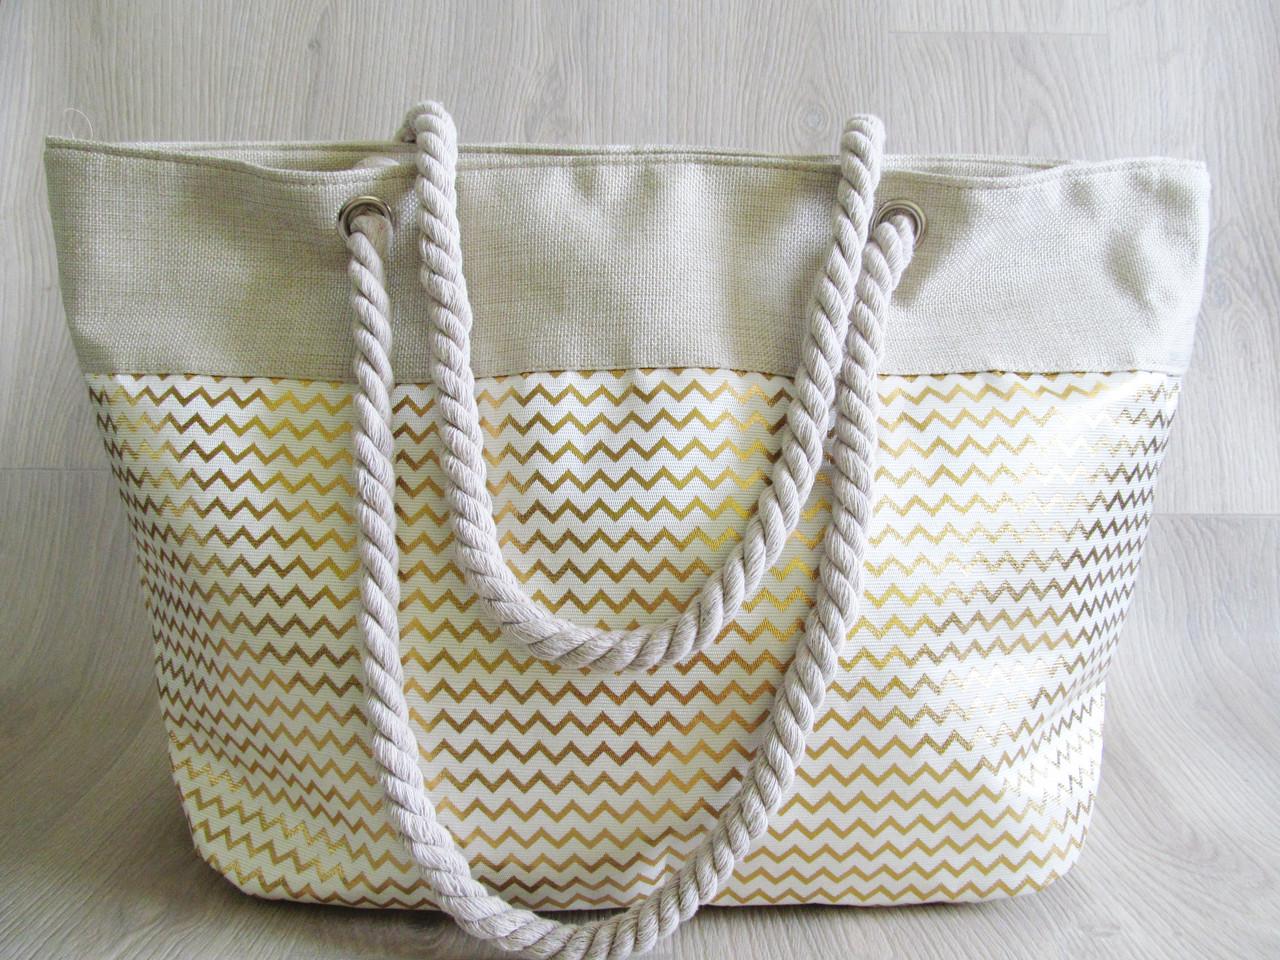 040b9b3d6d11 Стильная пляжная сумка -